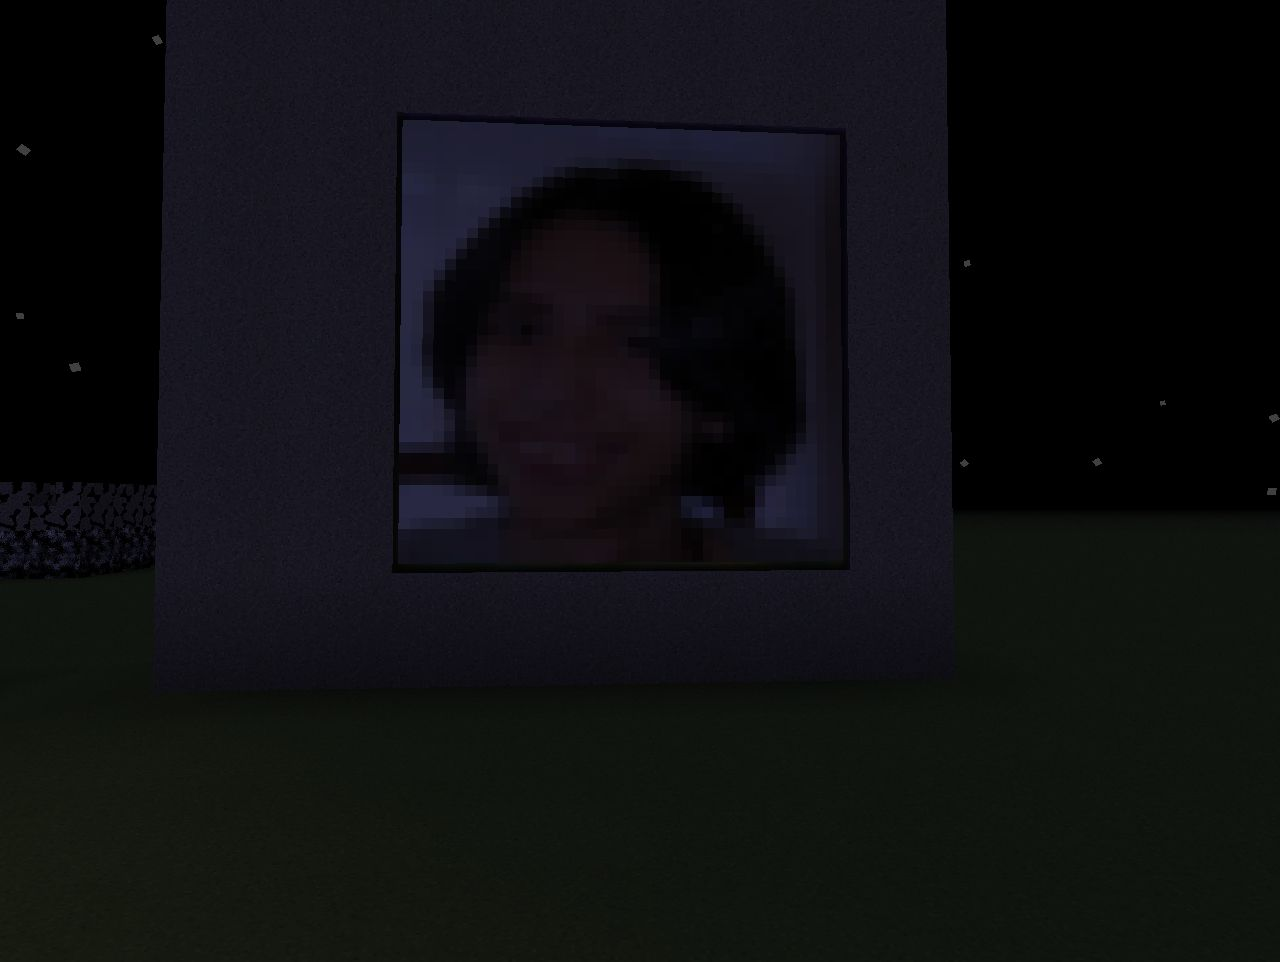 minecraft 64x64 images - digitalspace info